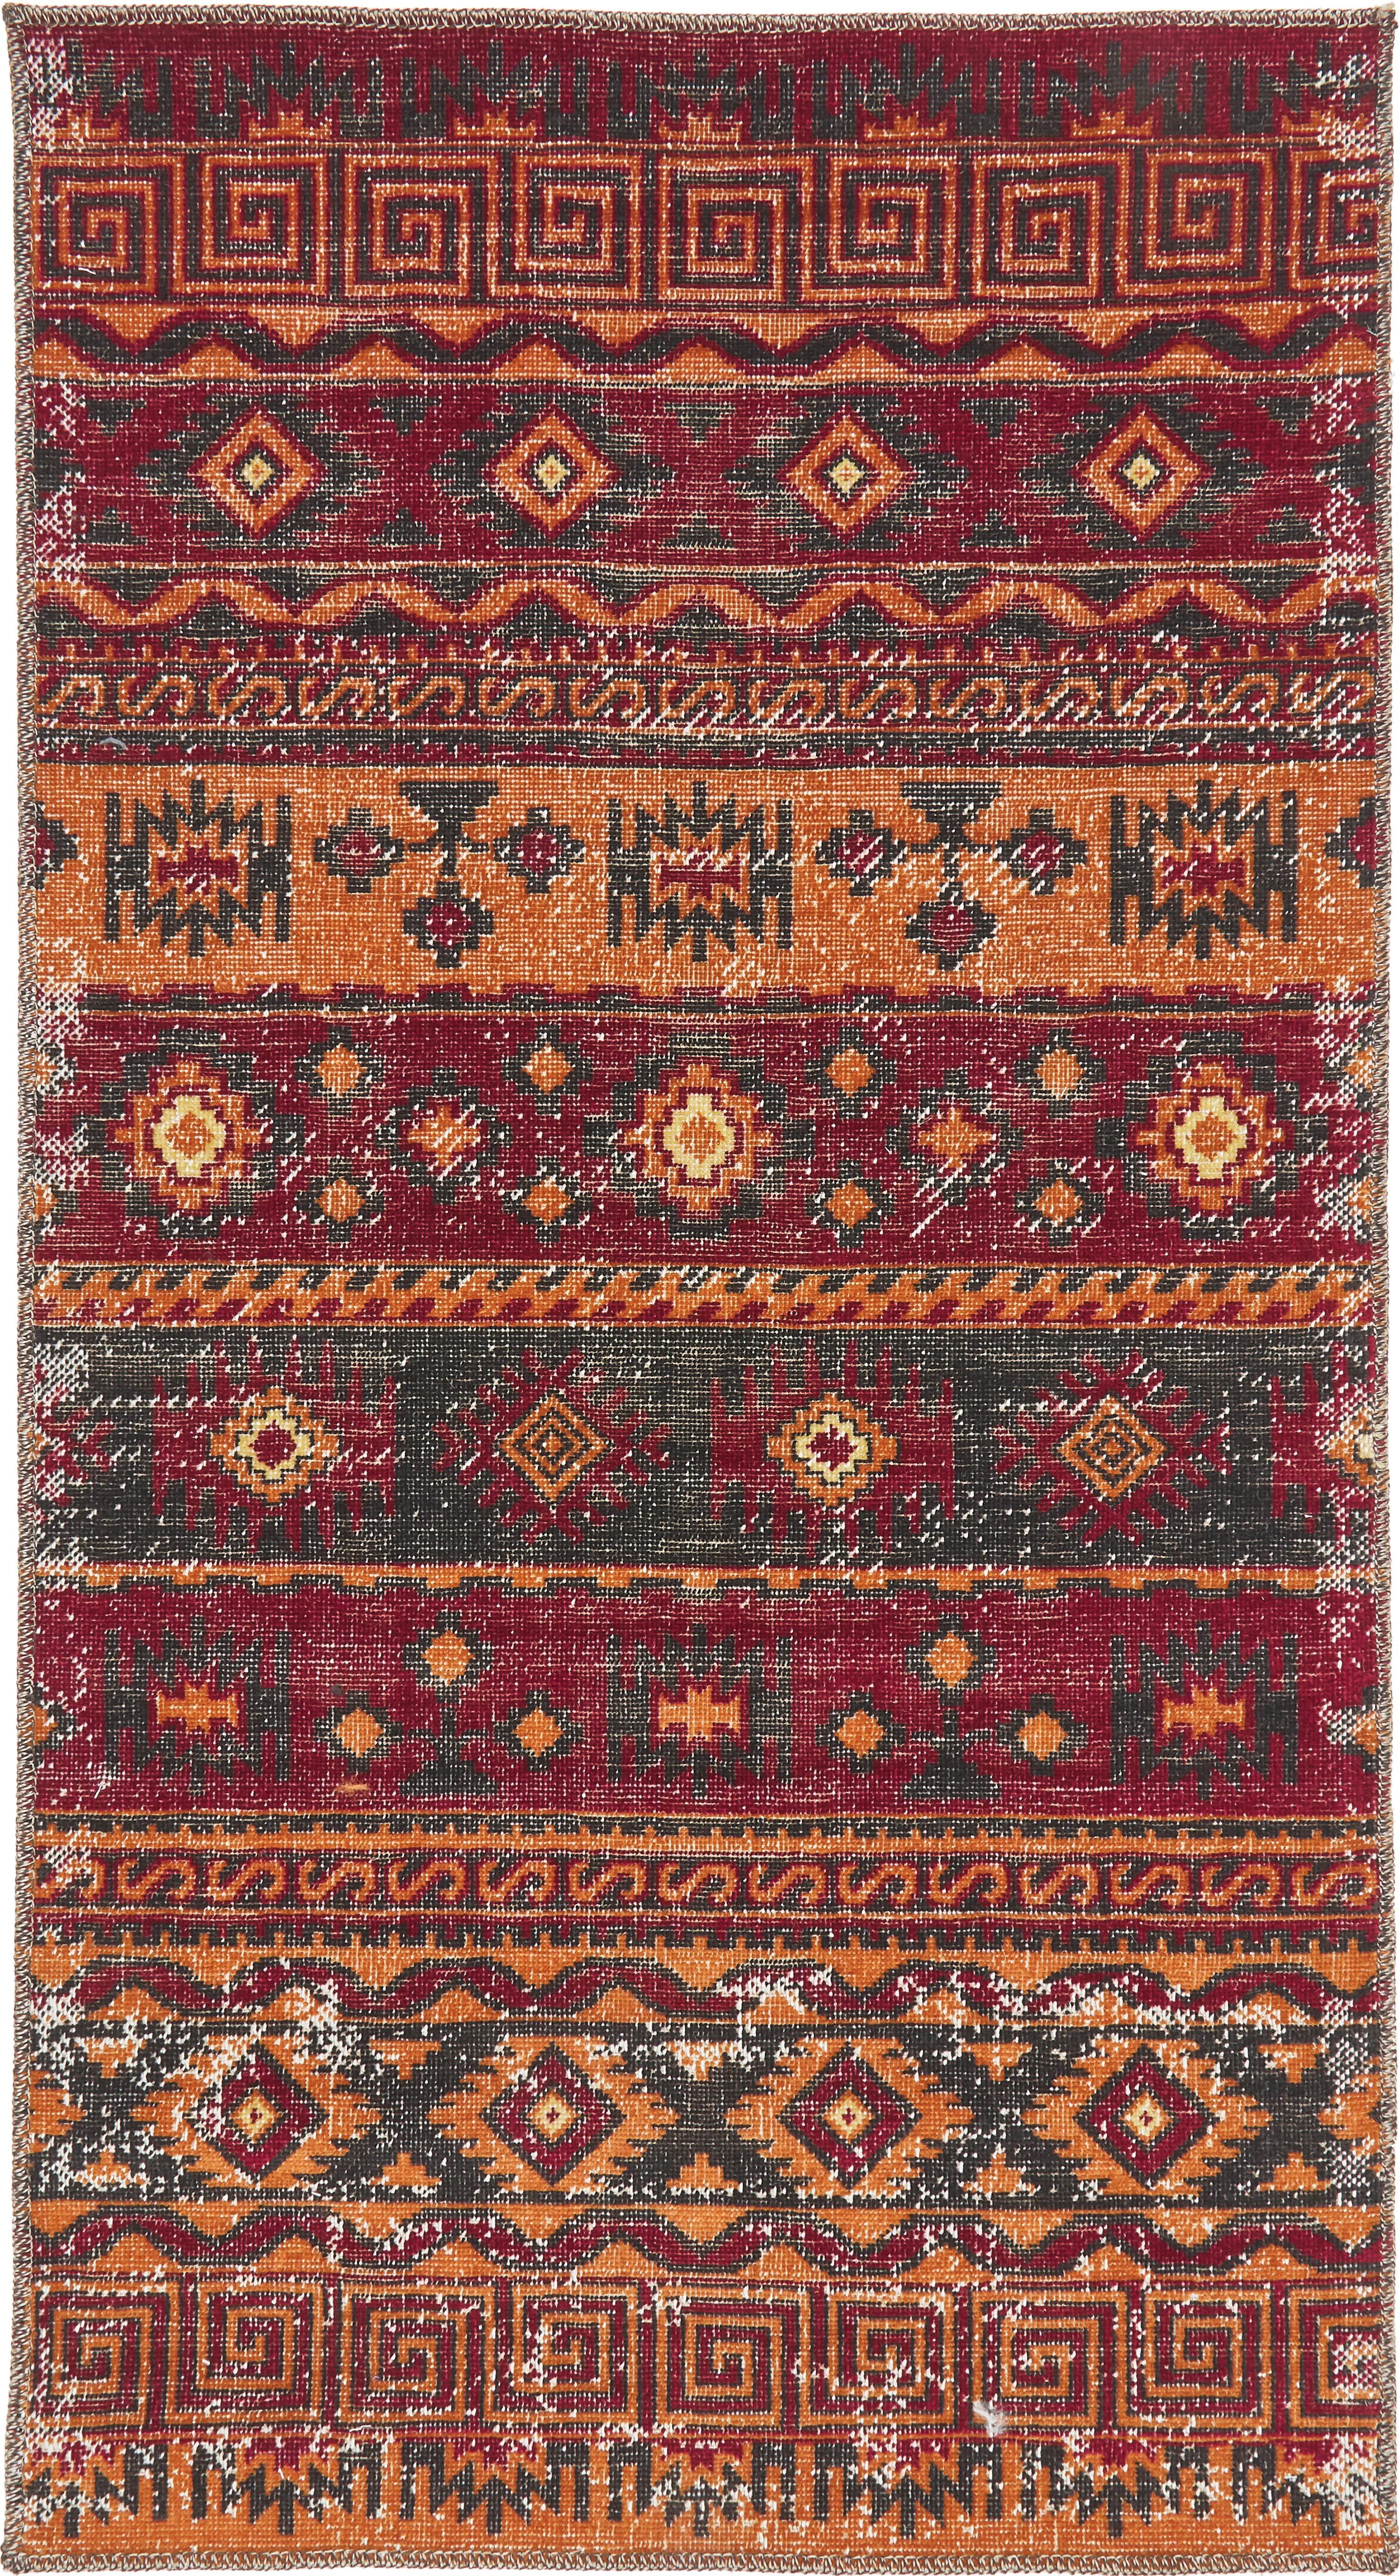 In- & Outdoor-Teppich Tilas Istanbul in Dunkelrot, Orient Style, Dunkelrot, Senfgelb, Khaki, B 80 x L 150 cm (Größe XS)